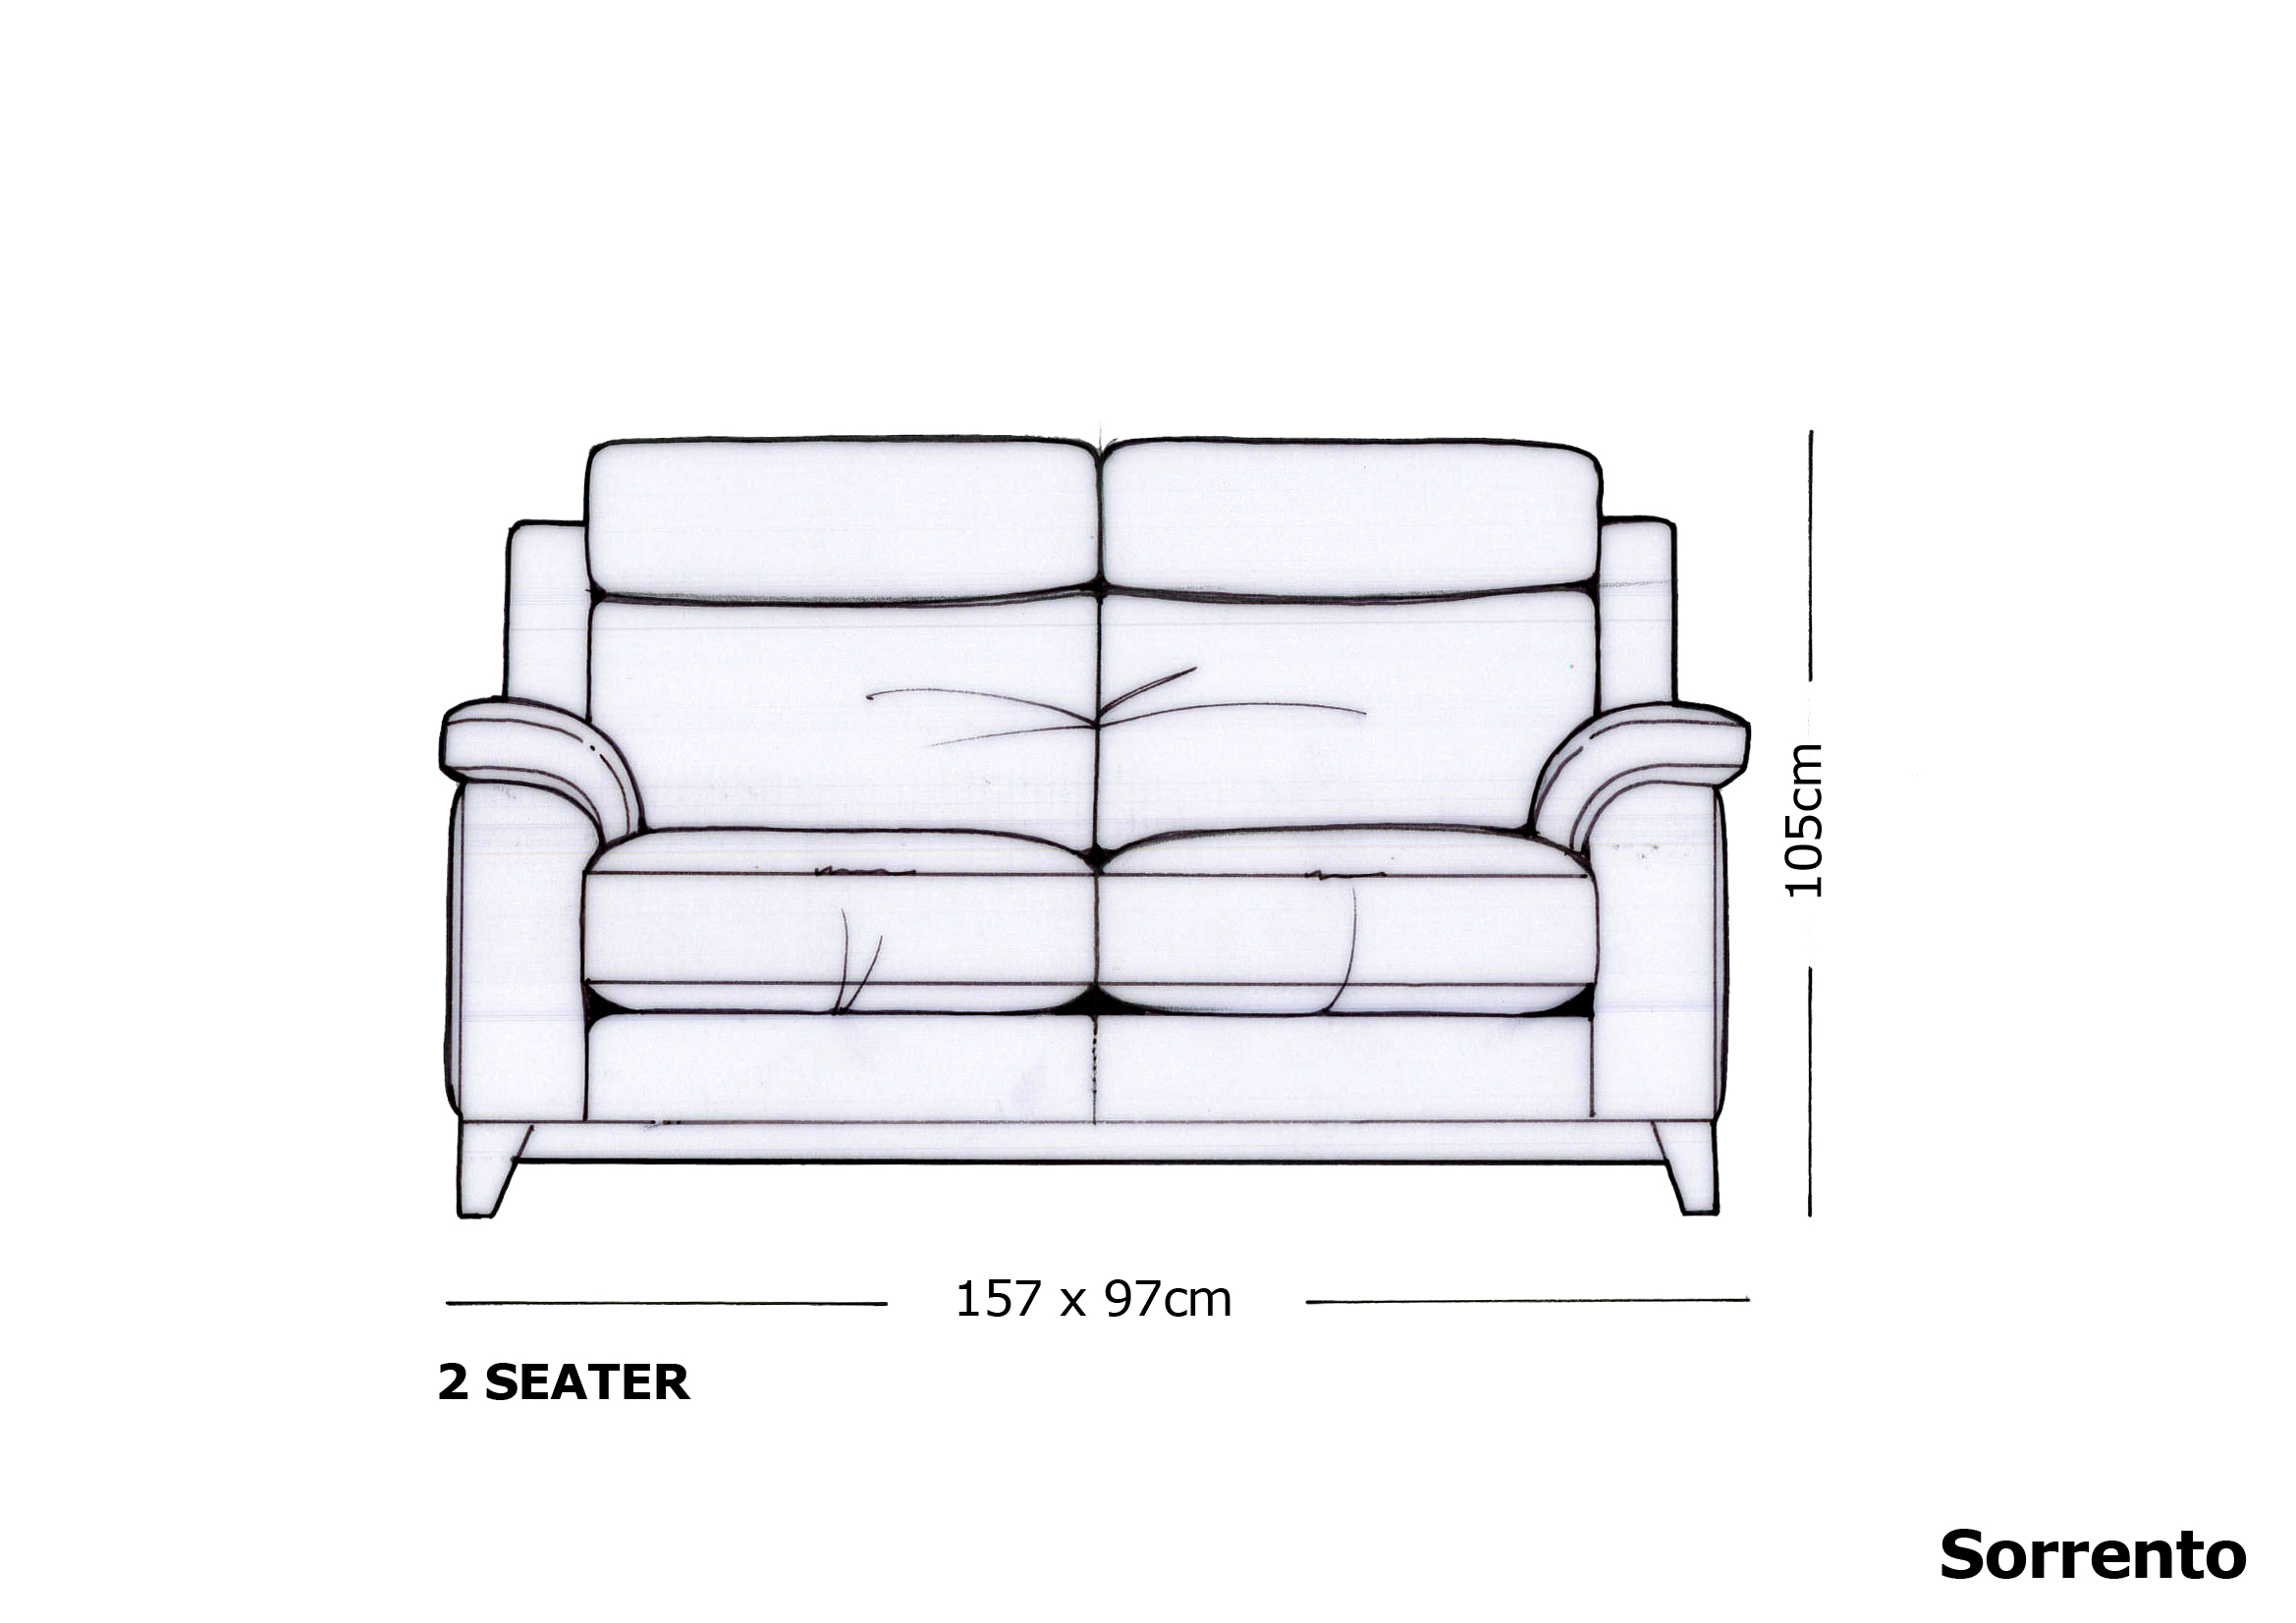 Sorrento 2 Seater Dimensions.jpg